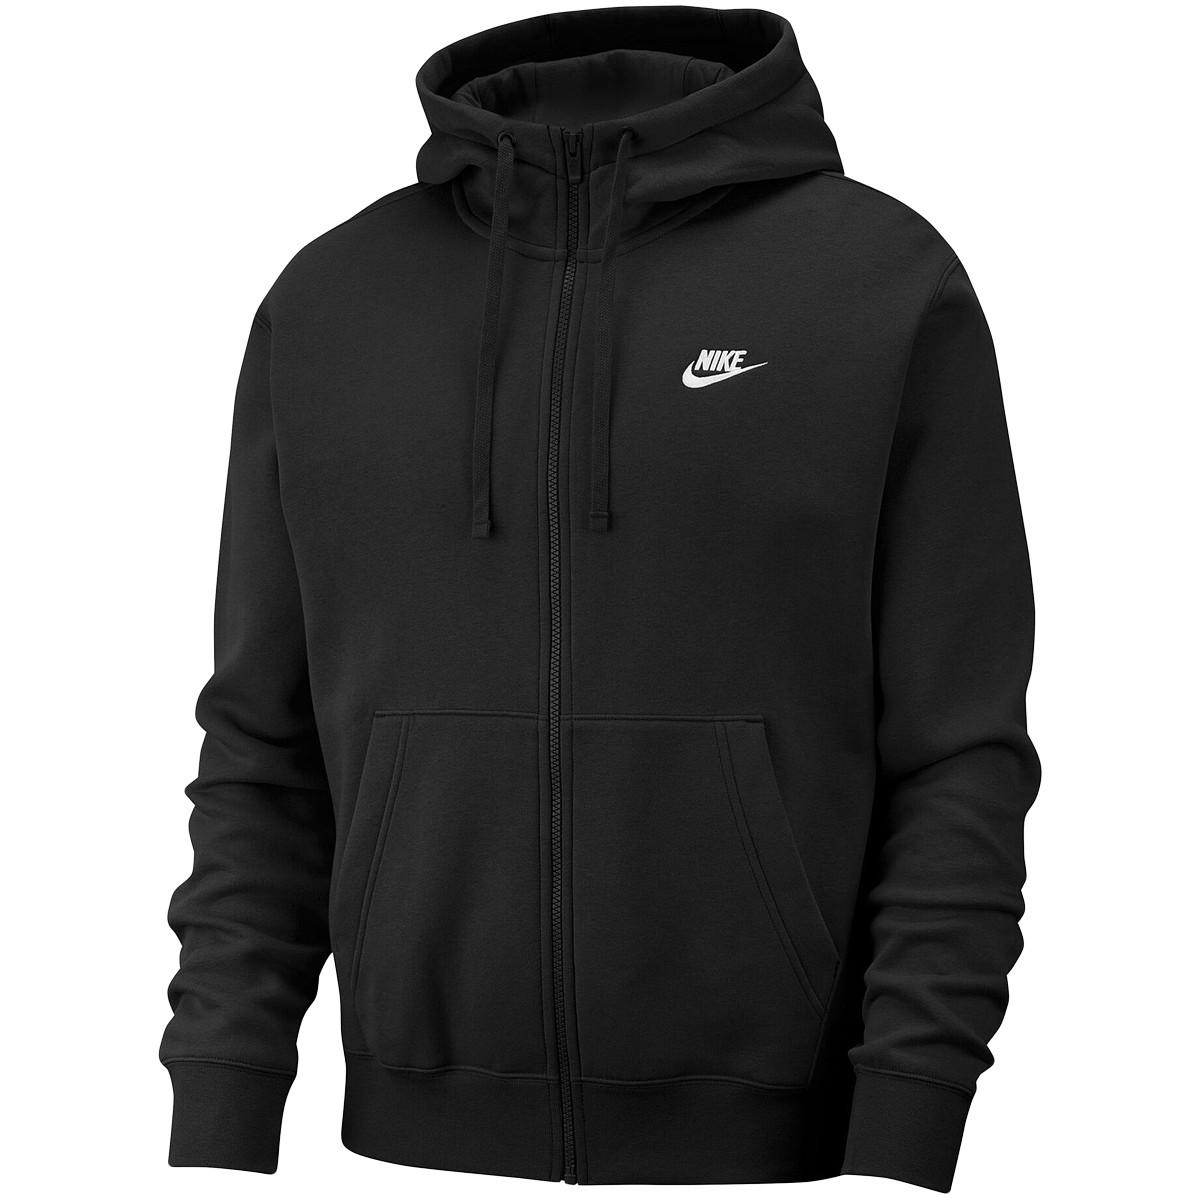 progenie Eso Conquista  NIKE SPORTSWEAR CLUB ZIPPED HOODIE - NIKE - Men's - Clothing | Tennispro